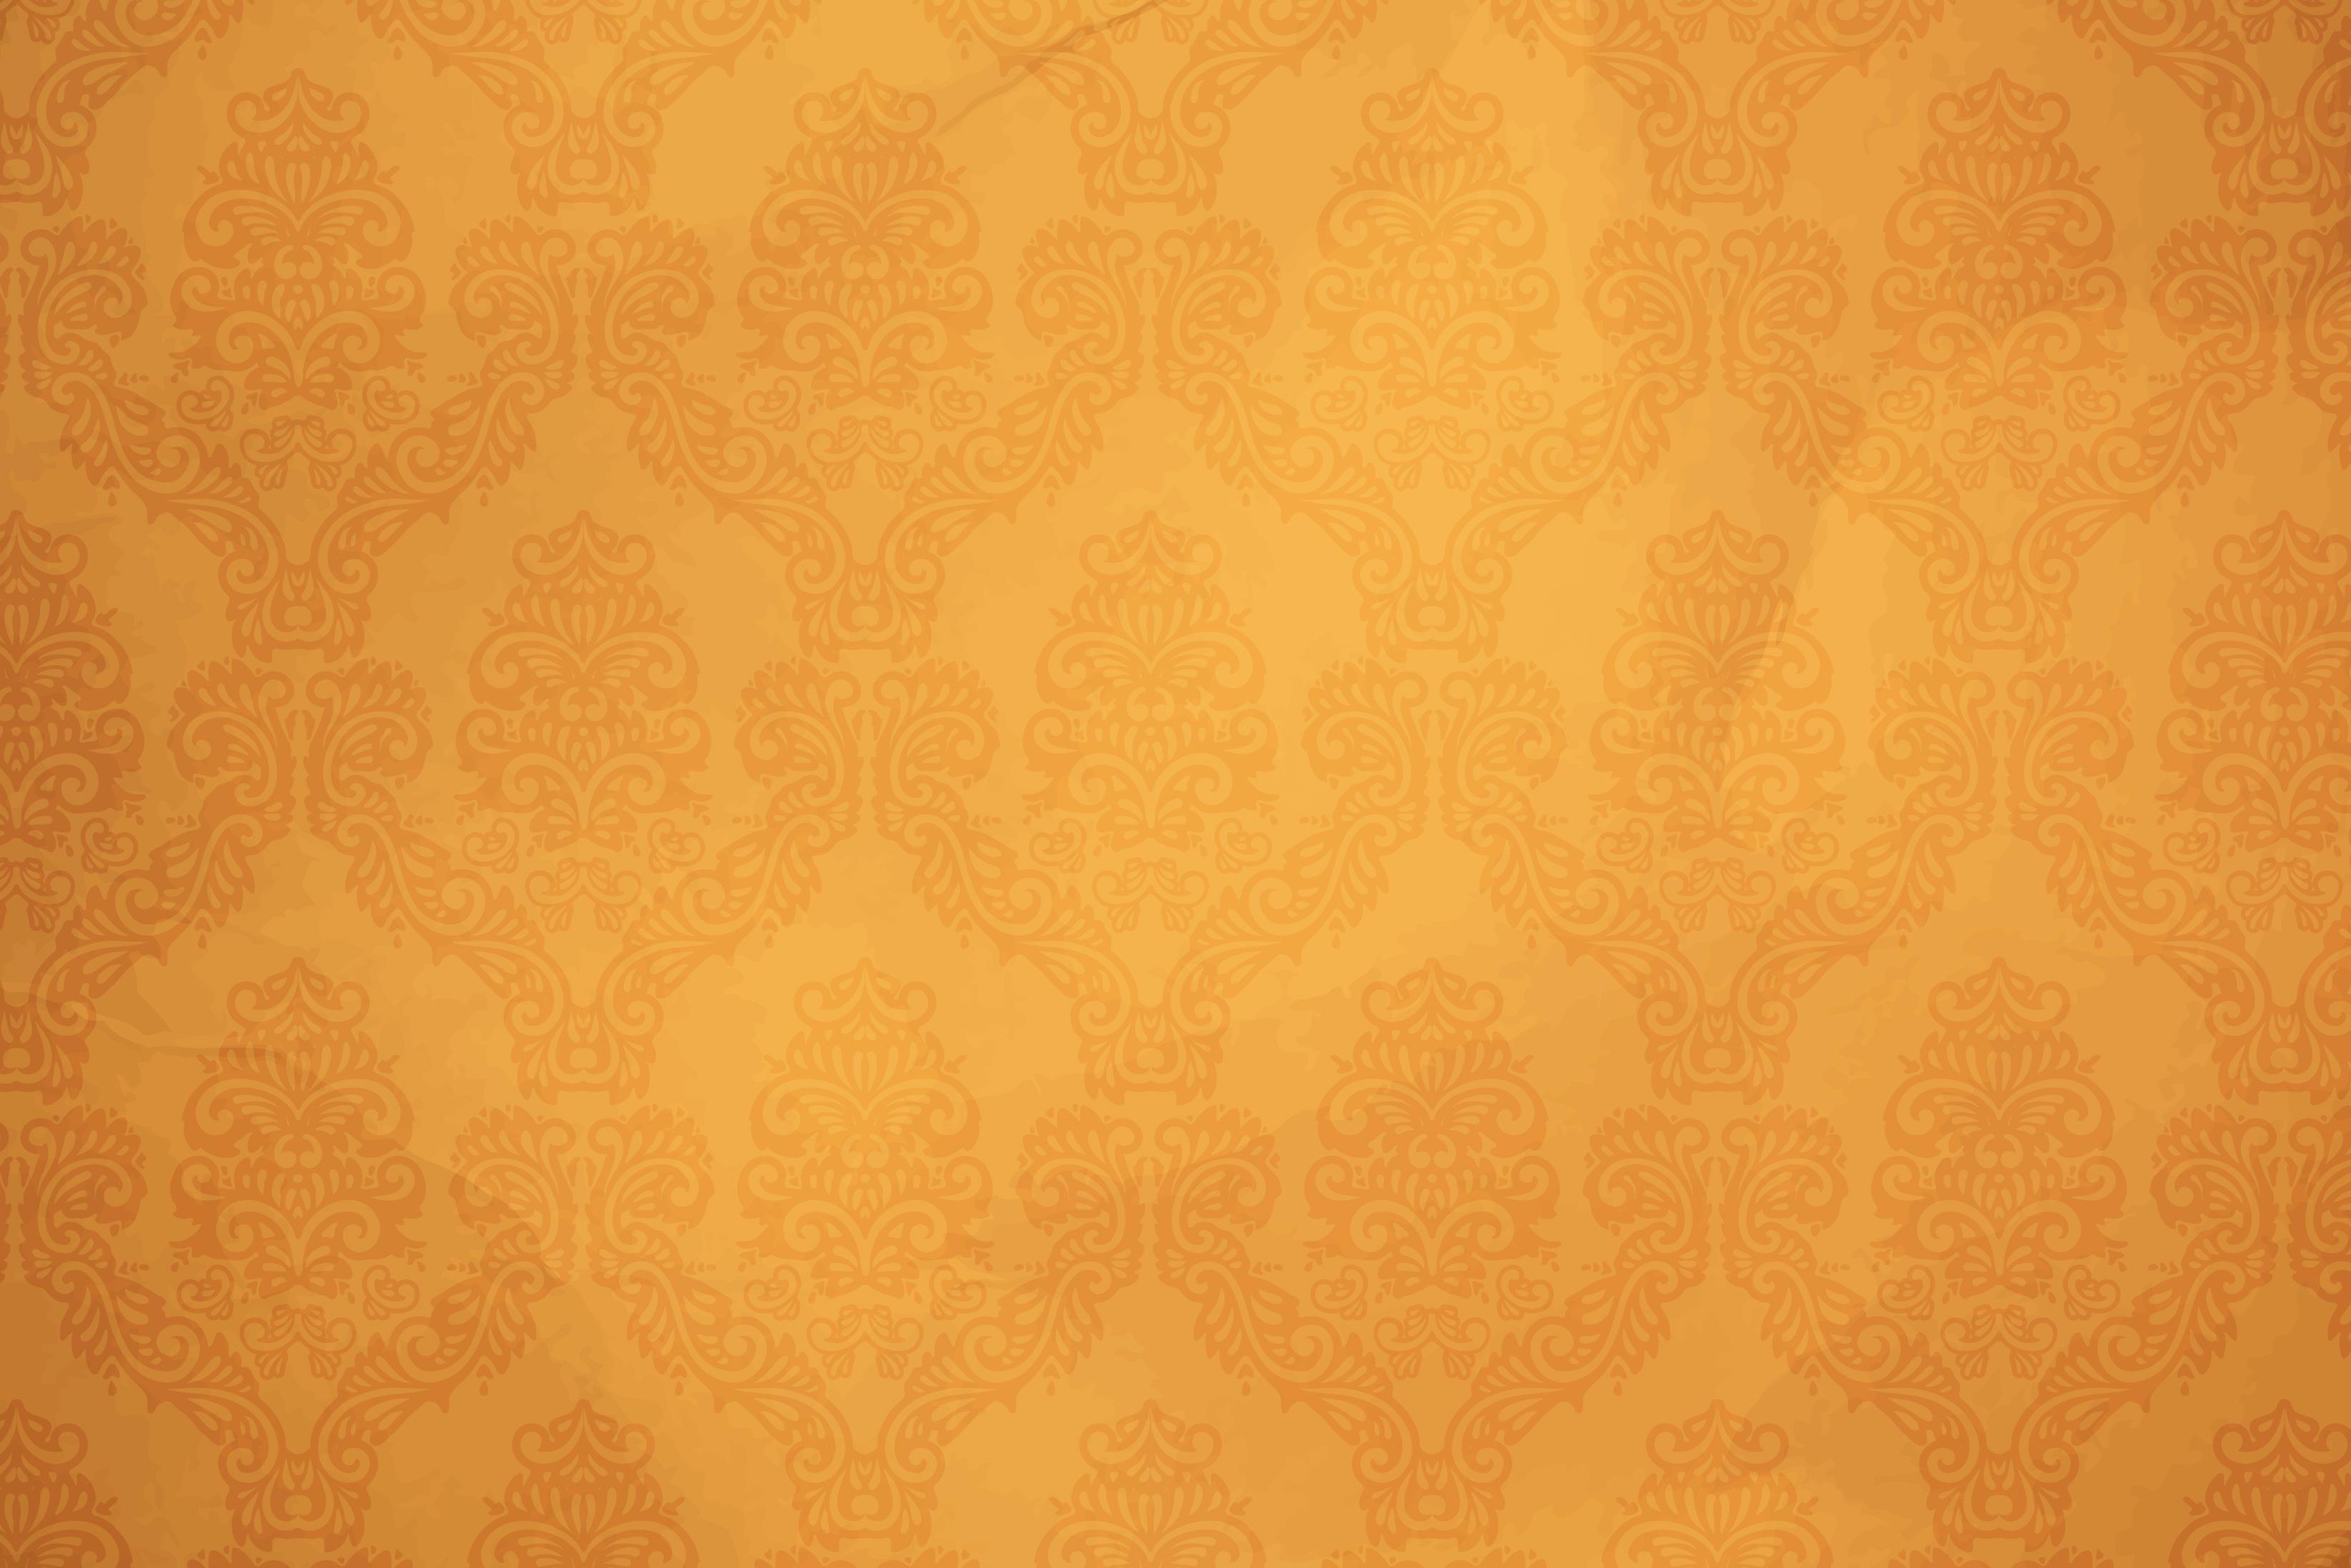 Motorwerks Of Barrington >> Texture Background Images Hd - Impre Media